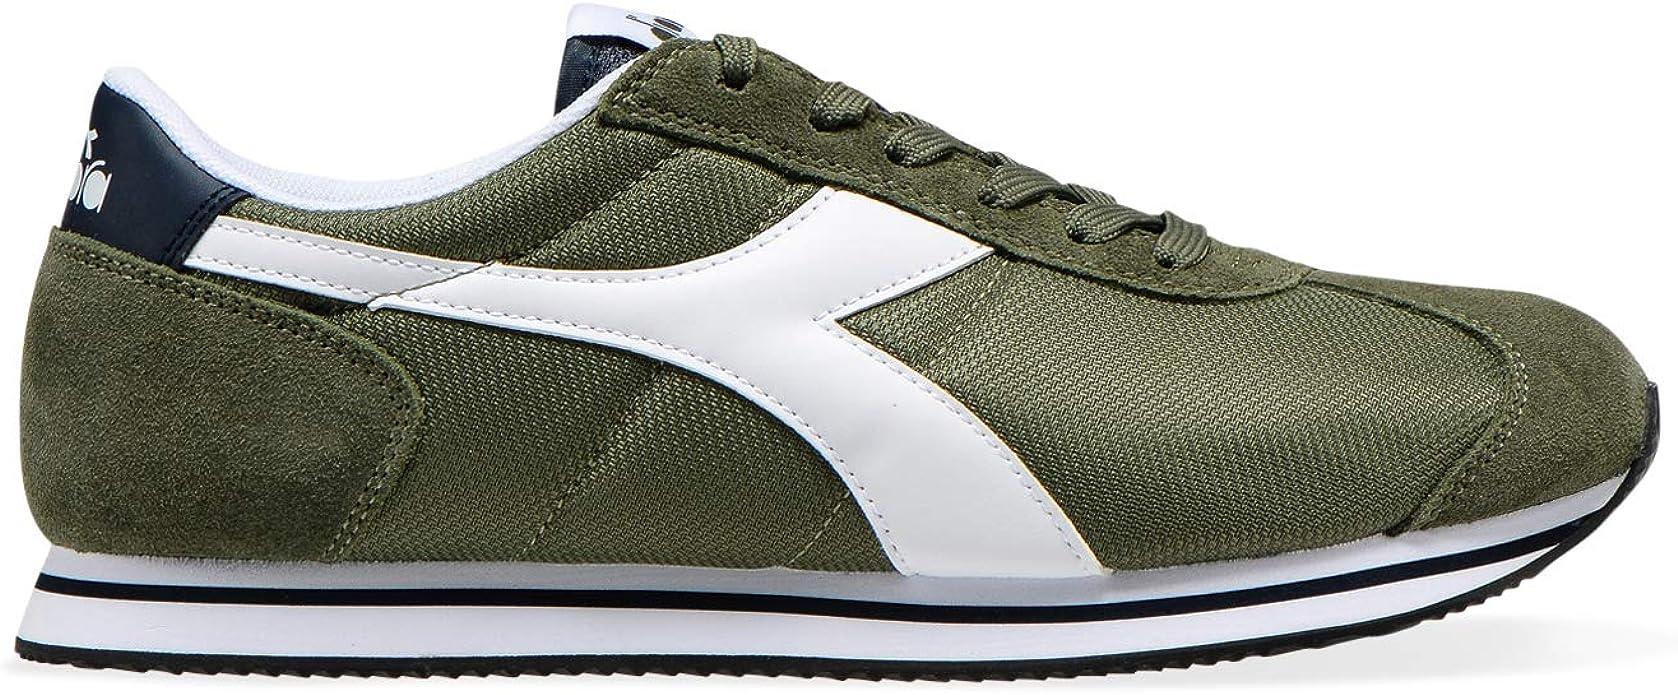 Diadora - Sneakers Vega for Man US   Shoes